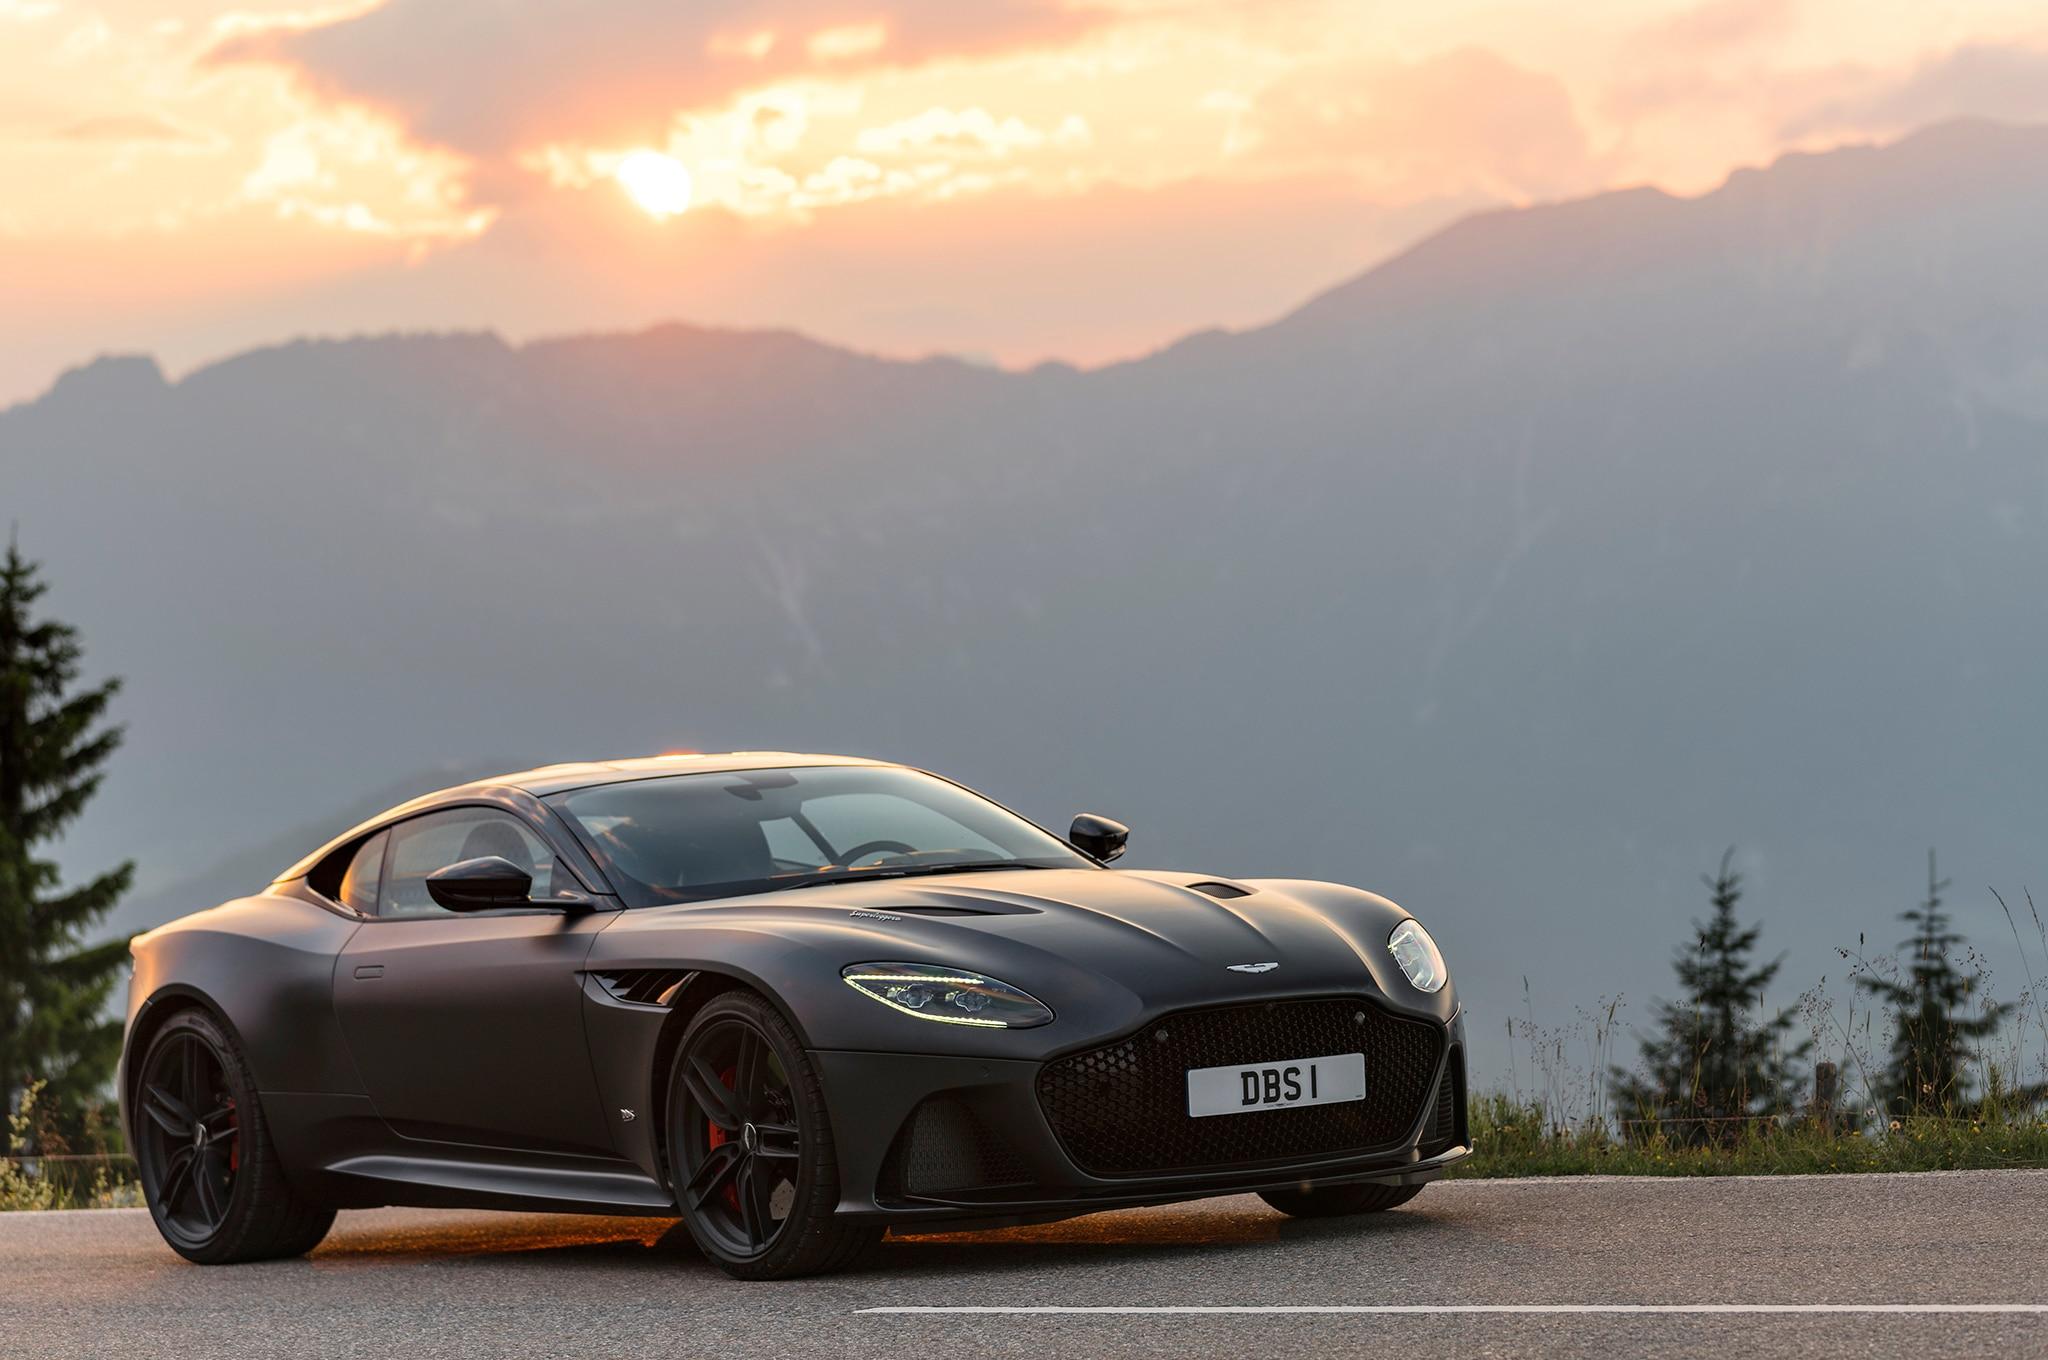 2019 Aston Martin Dbs Superleggera First Drive Review Automobile